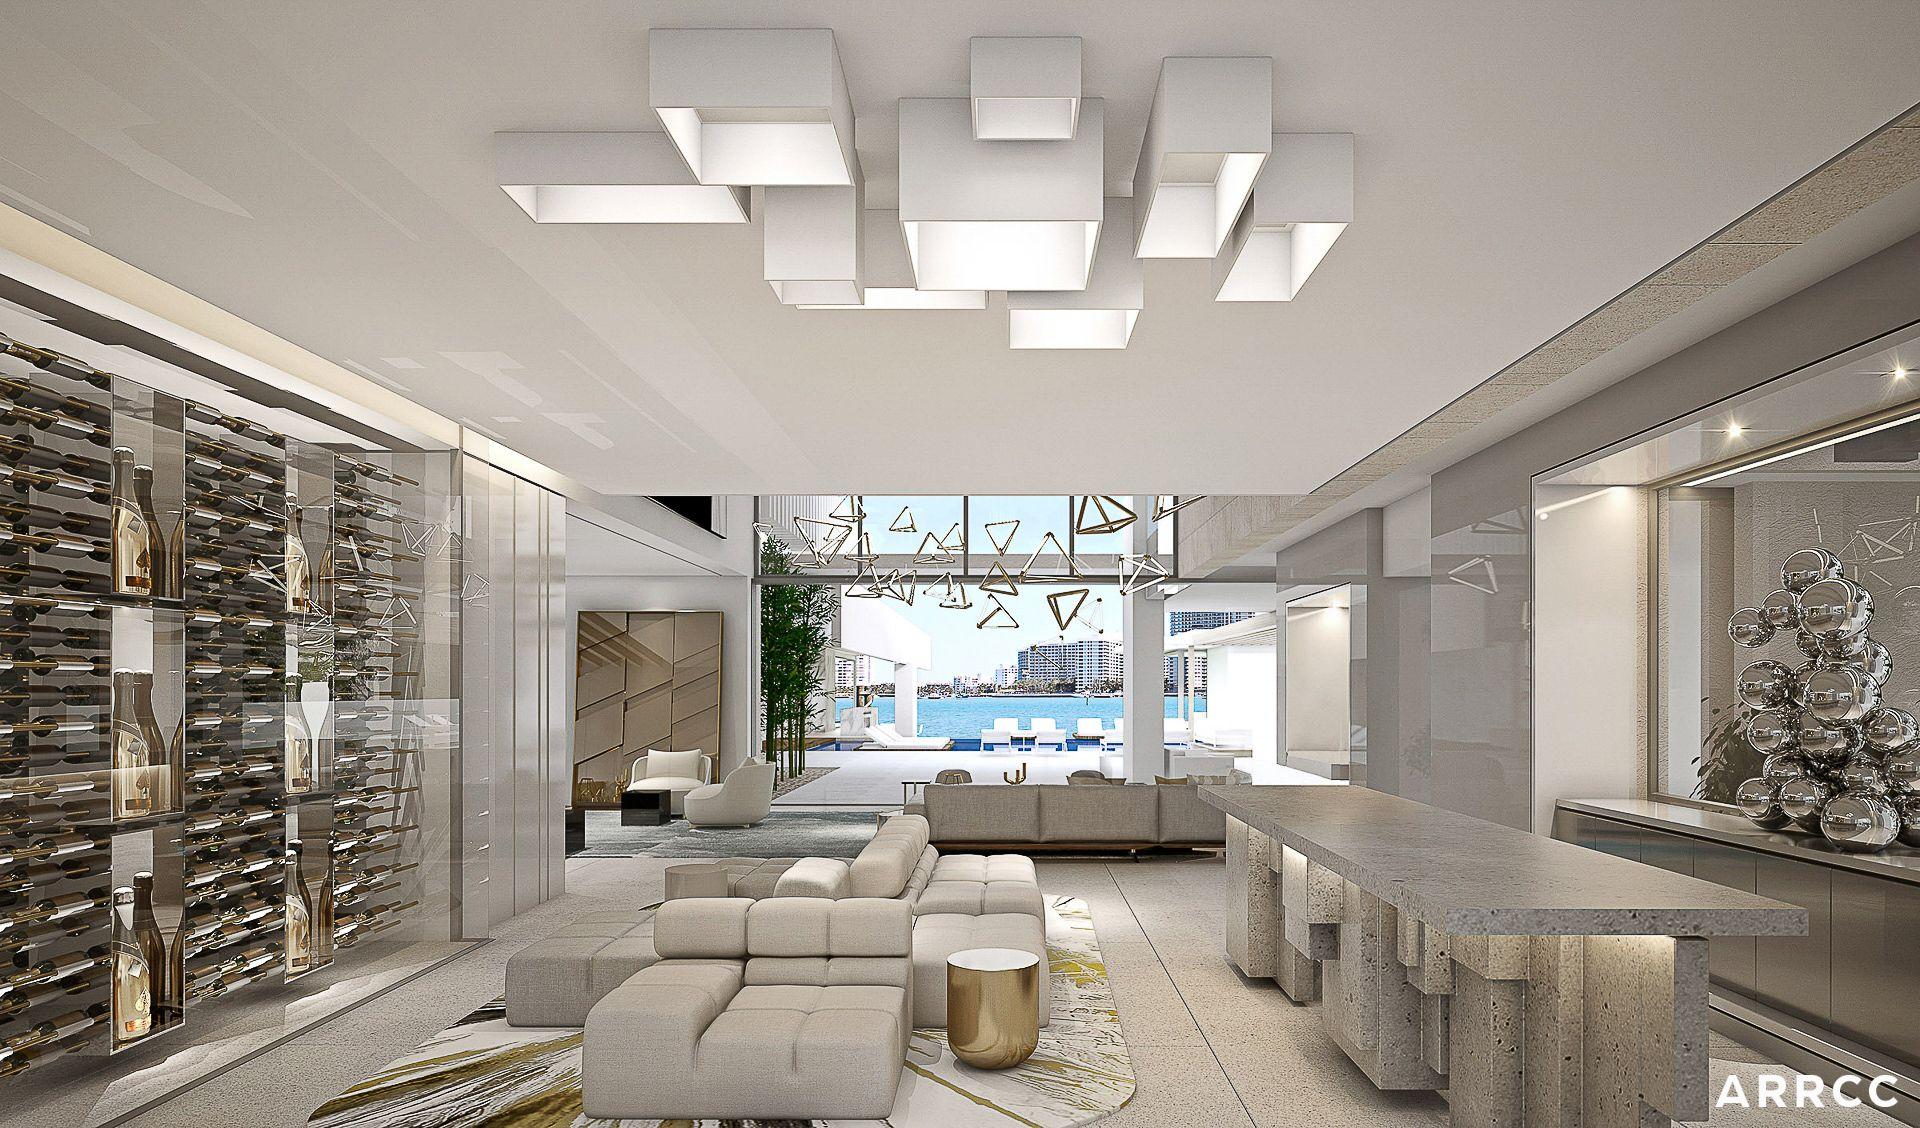 Us star arrcc inspiration design interior decor architecture house also rh pinterest